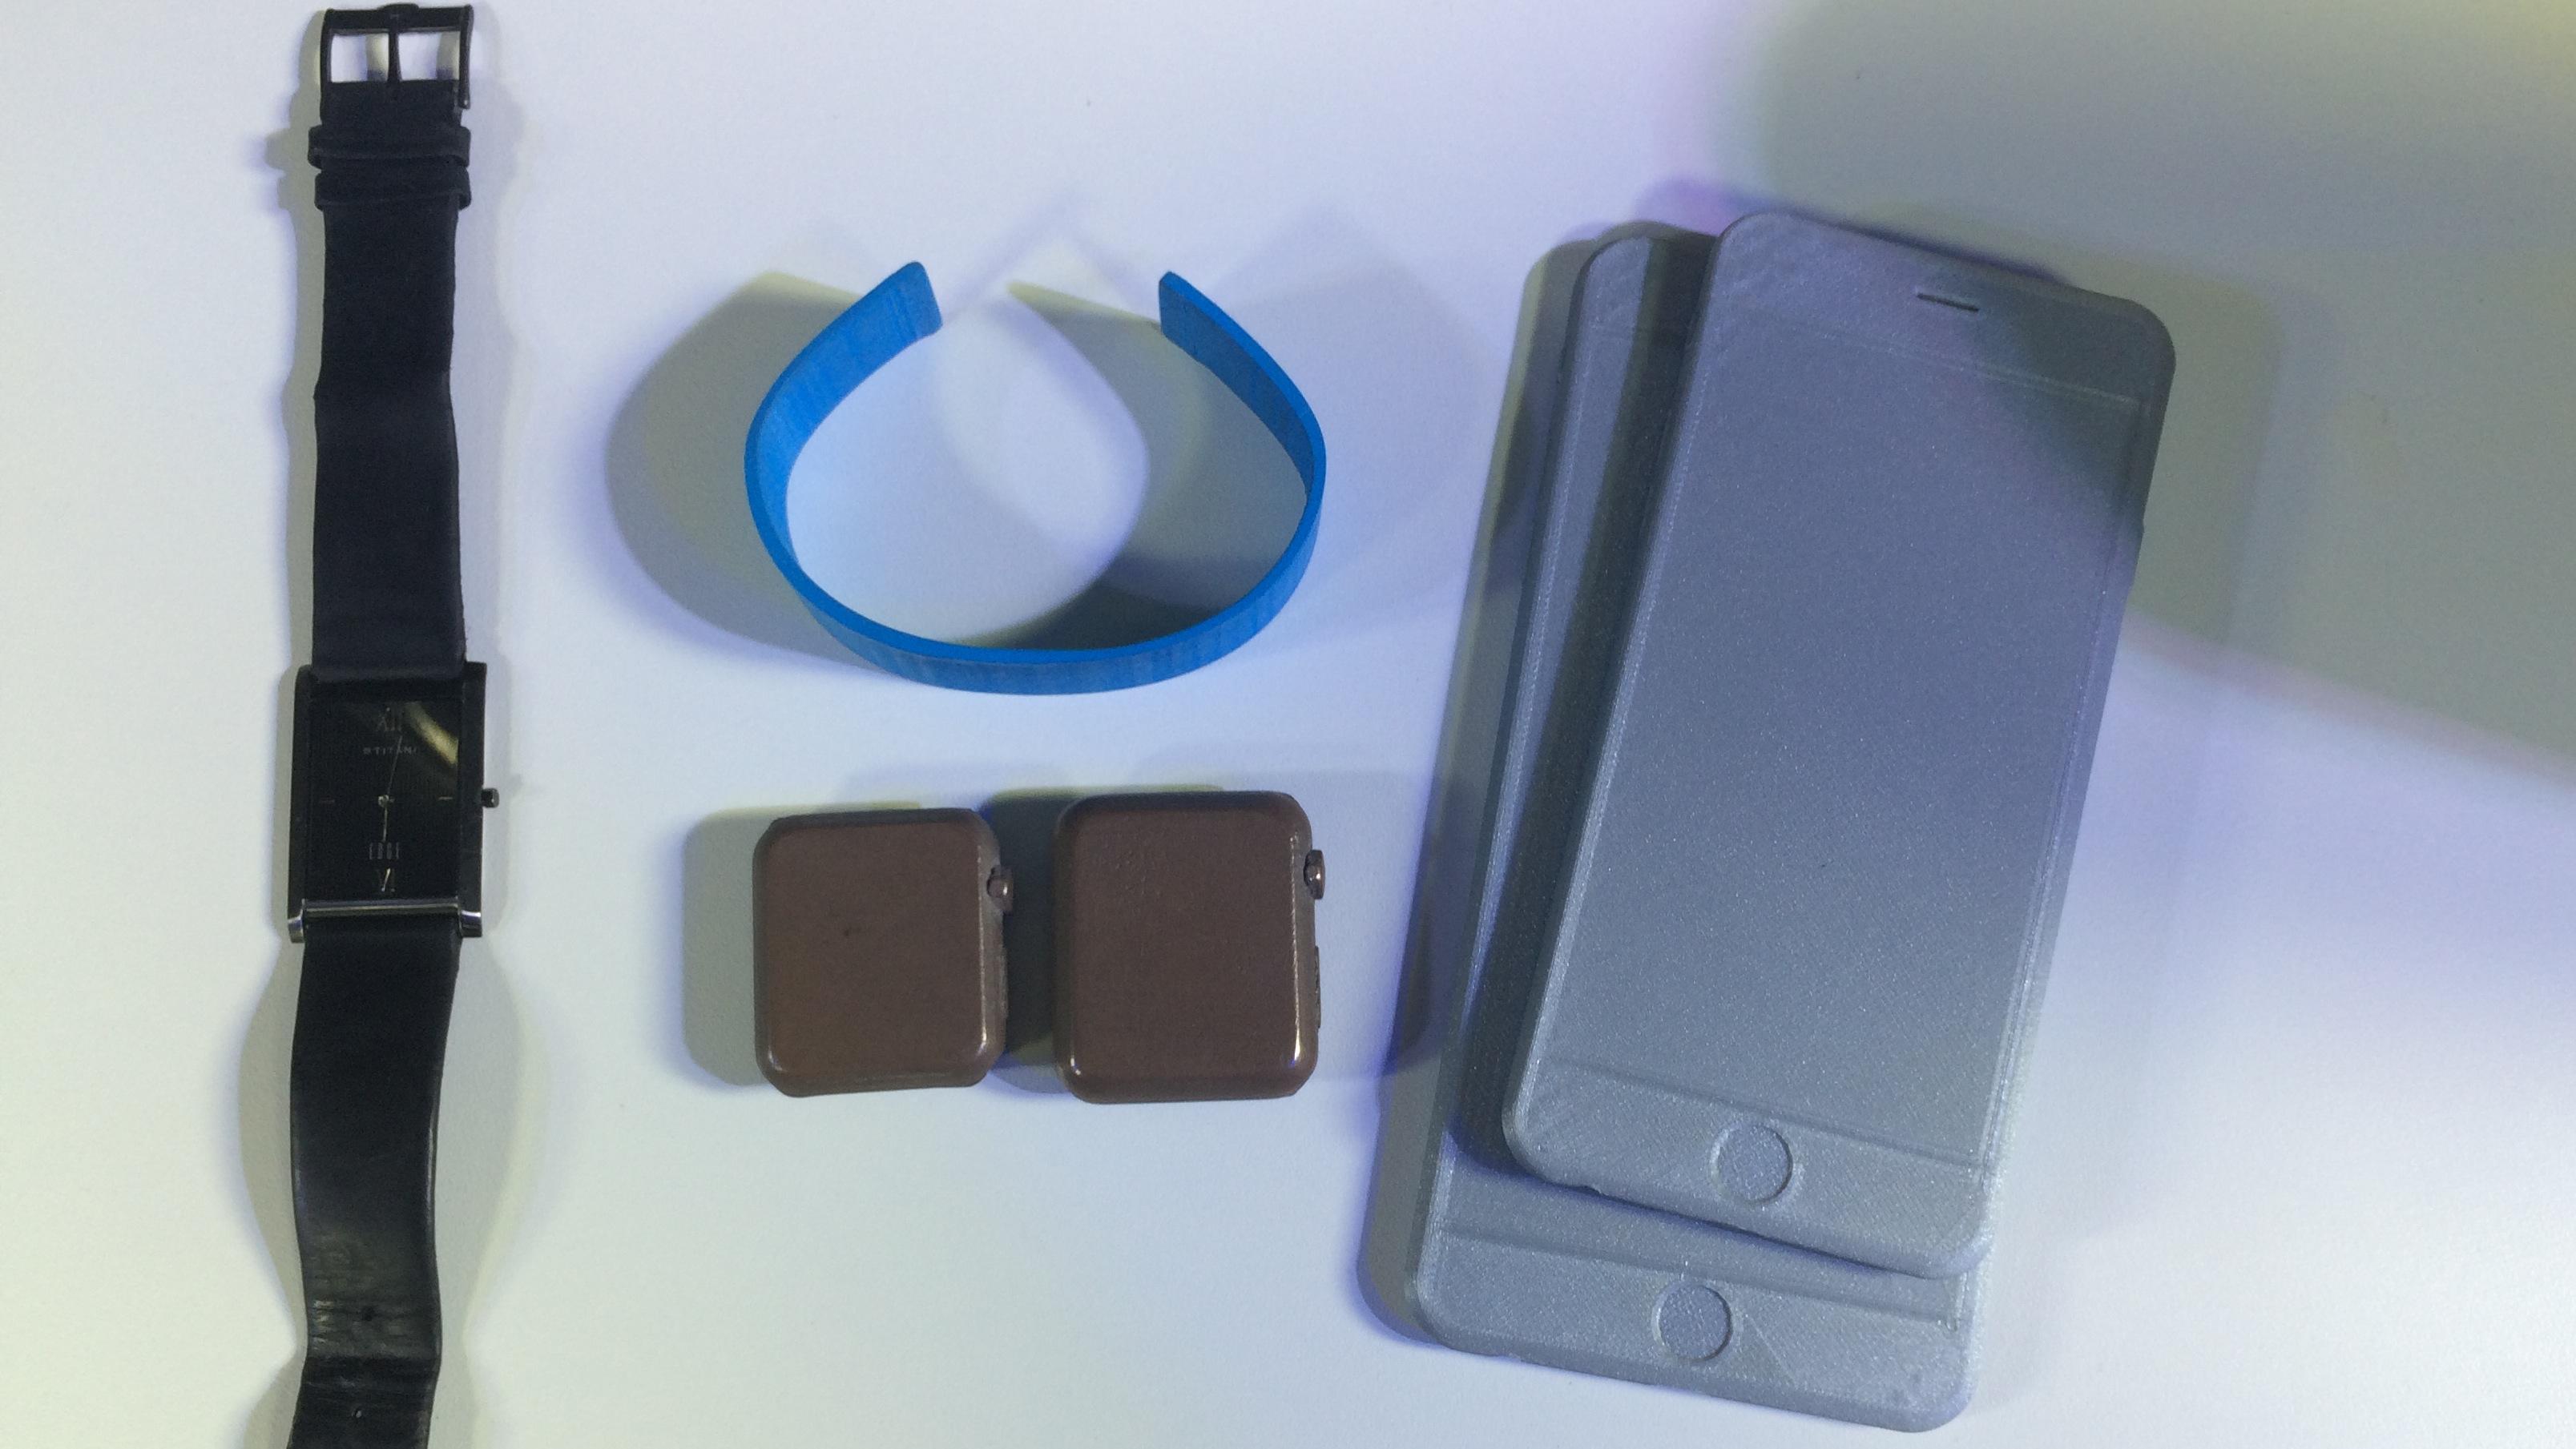 3dprint-applewatch-iphone6